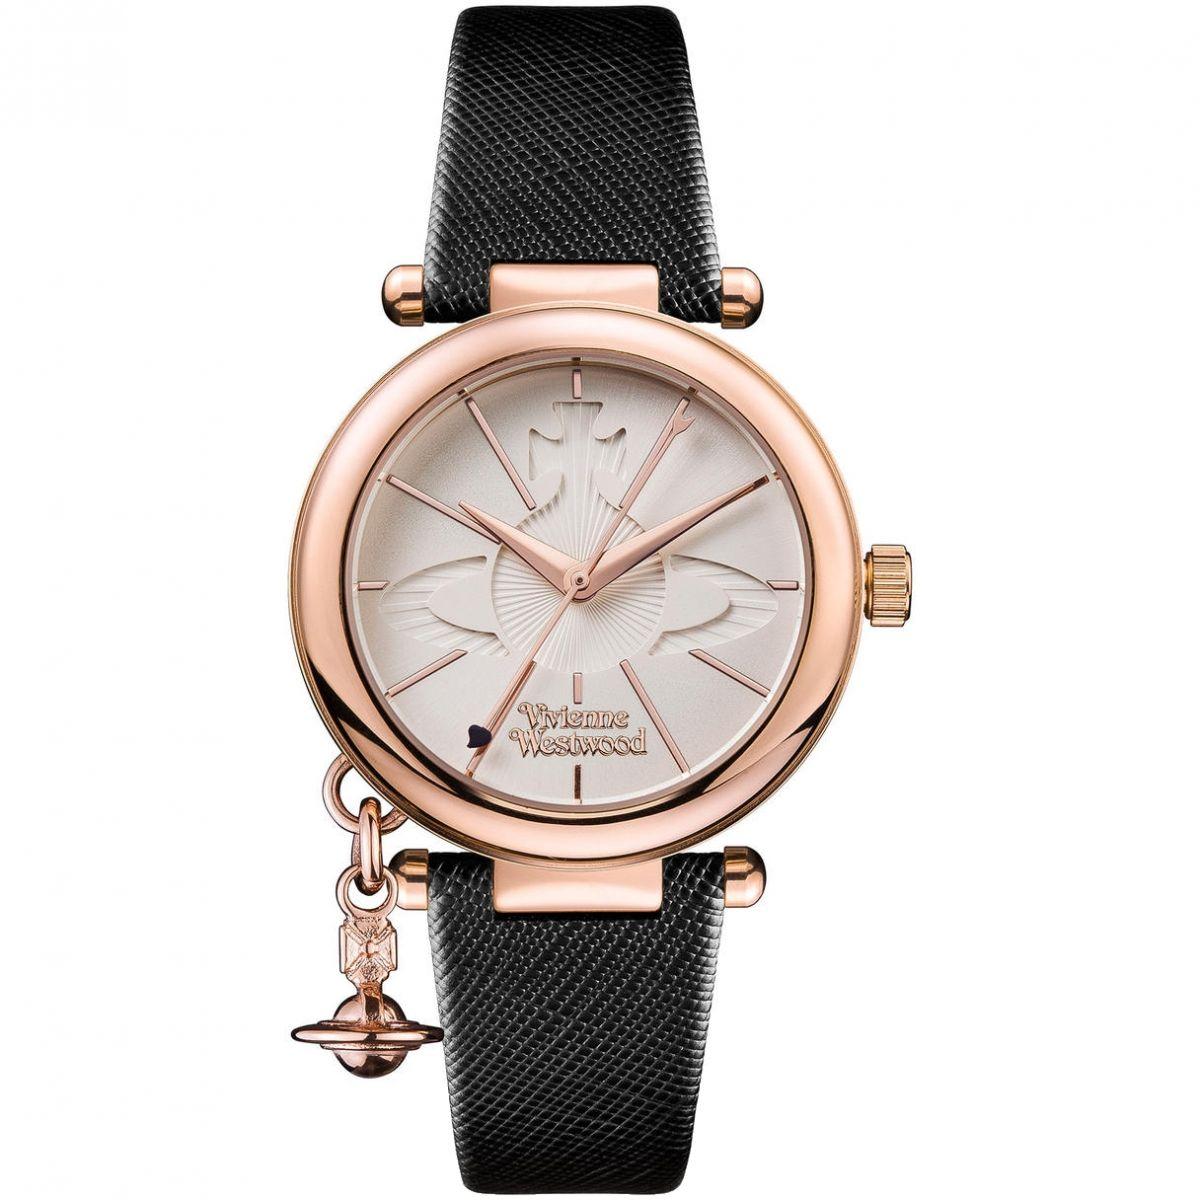 Vivienne Westwood Exclusive Watch